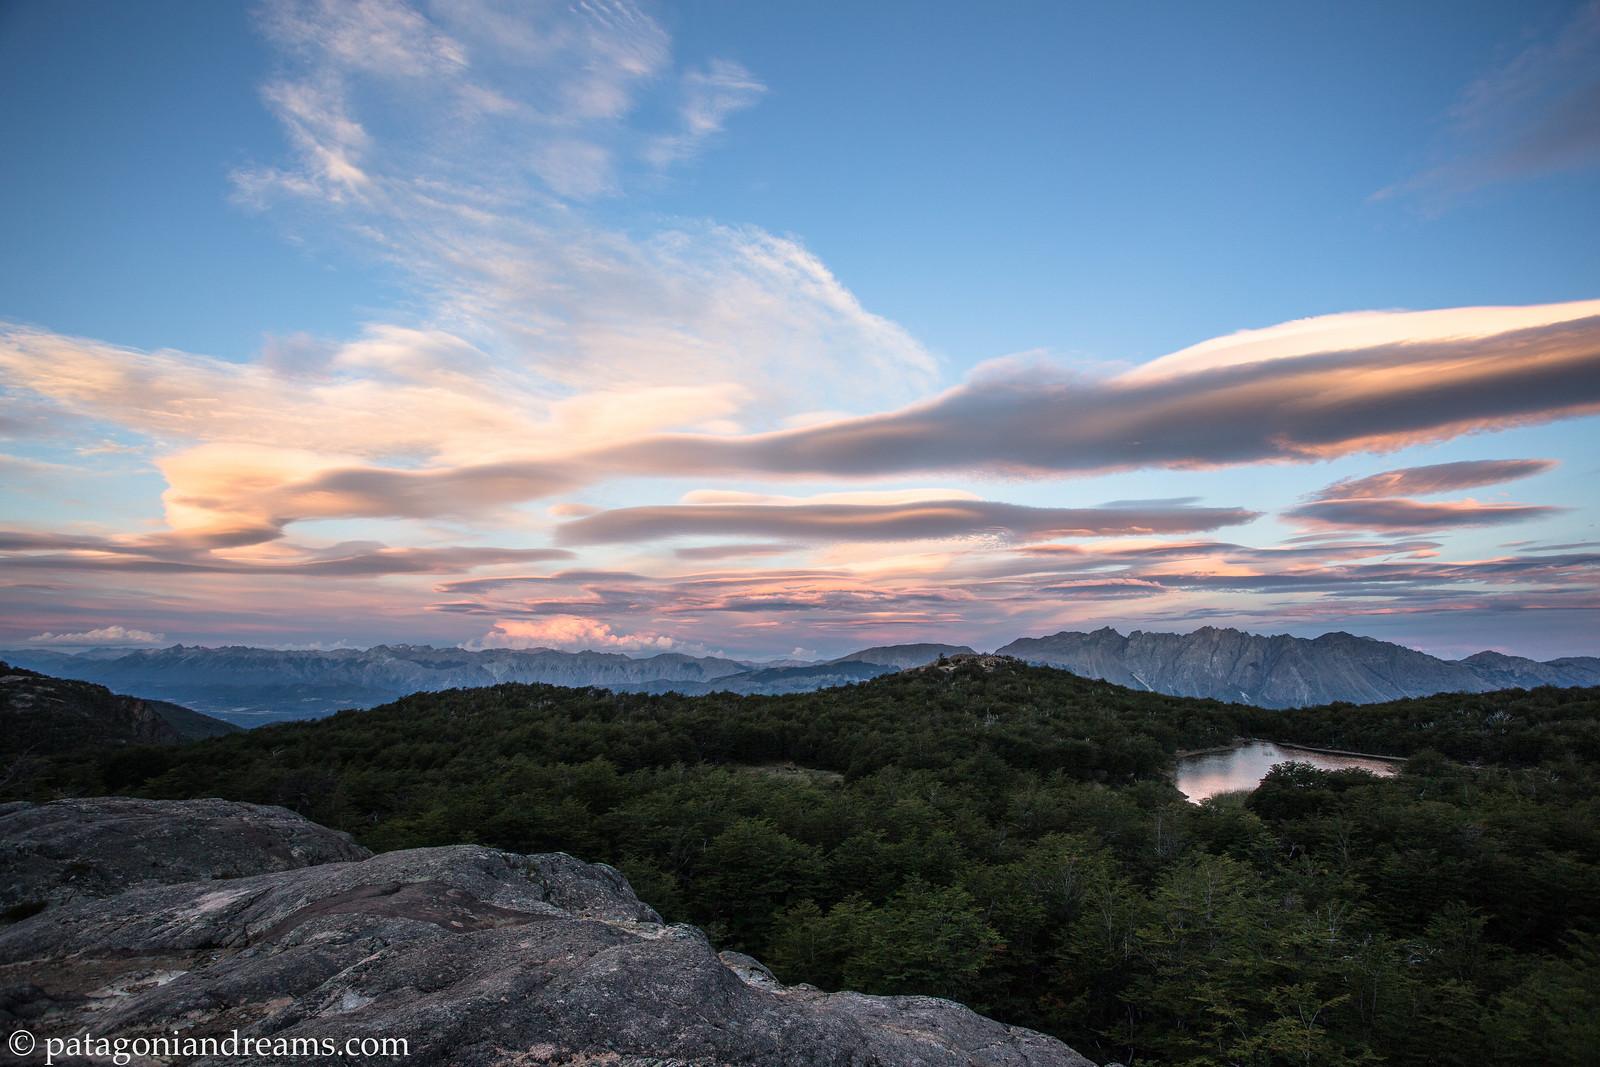 Patagonian skies. Comarca Andina del Paralelo 42. Rio Negro. Patagonia. Argentina.